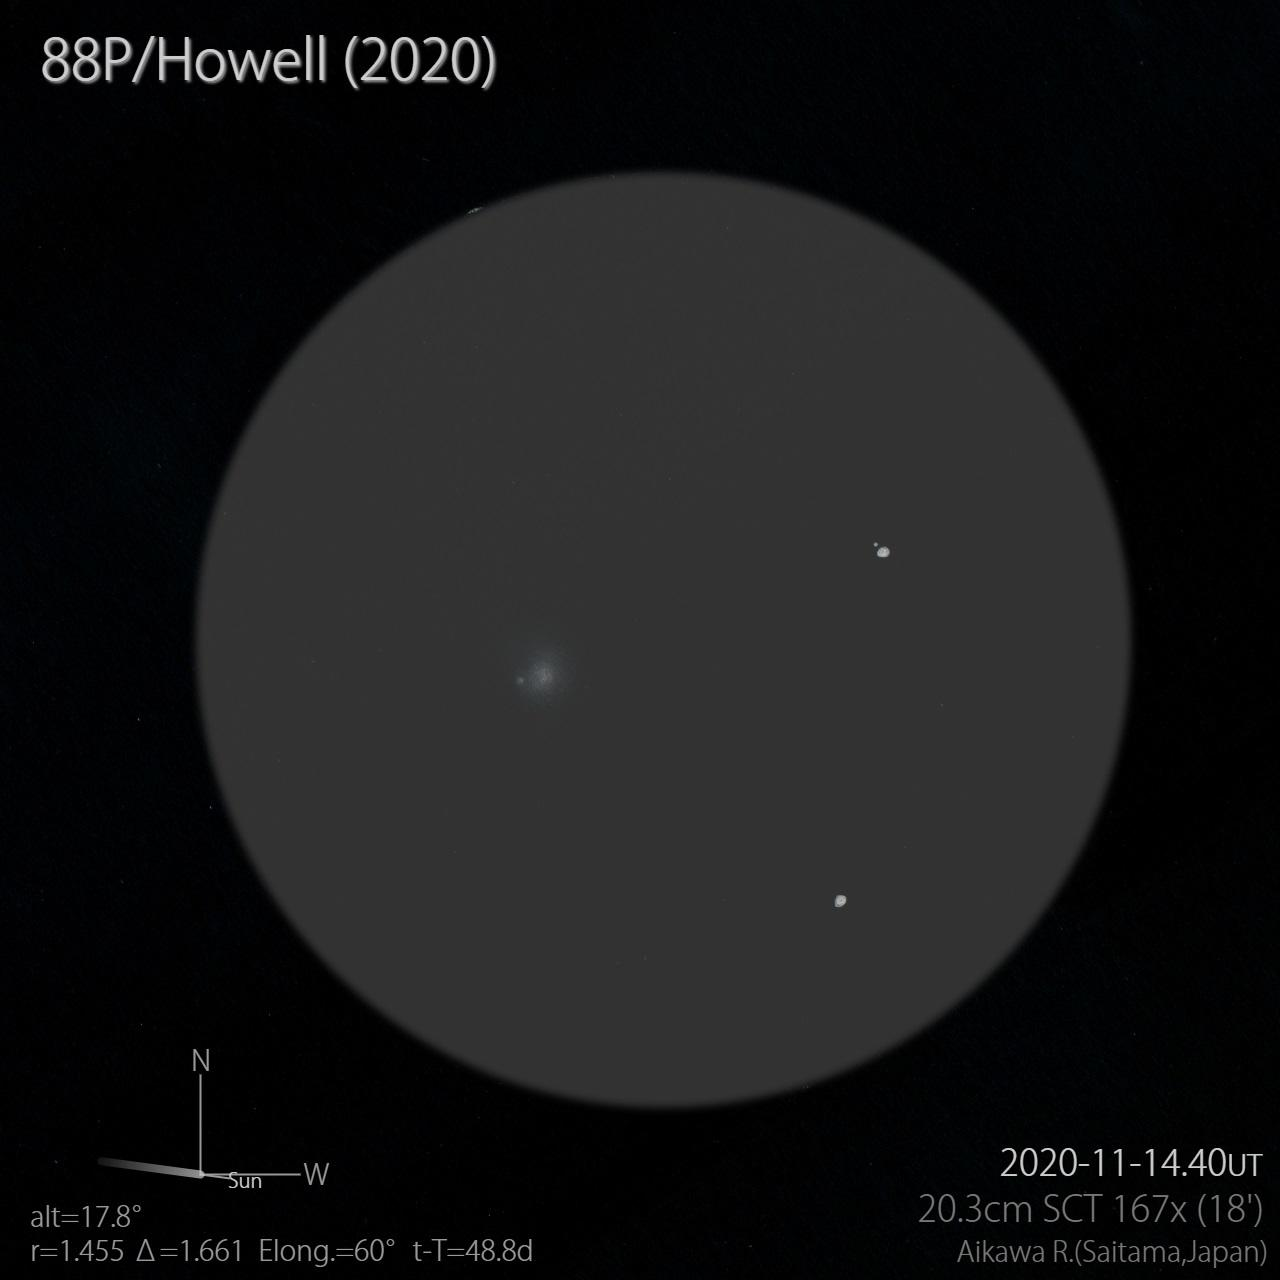 0088P-2020_001-editPosi-50-0.7.jpg